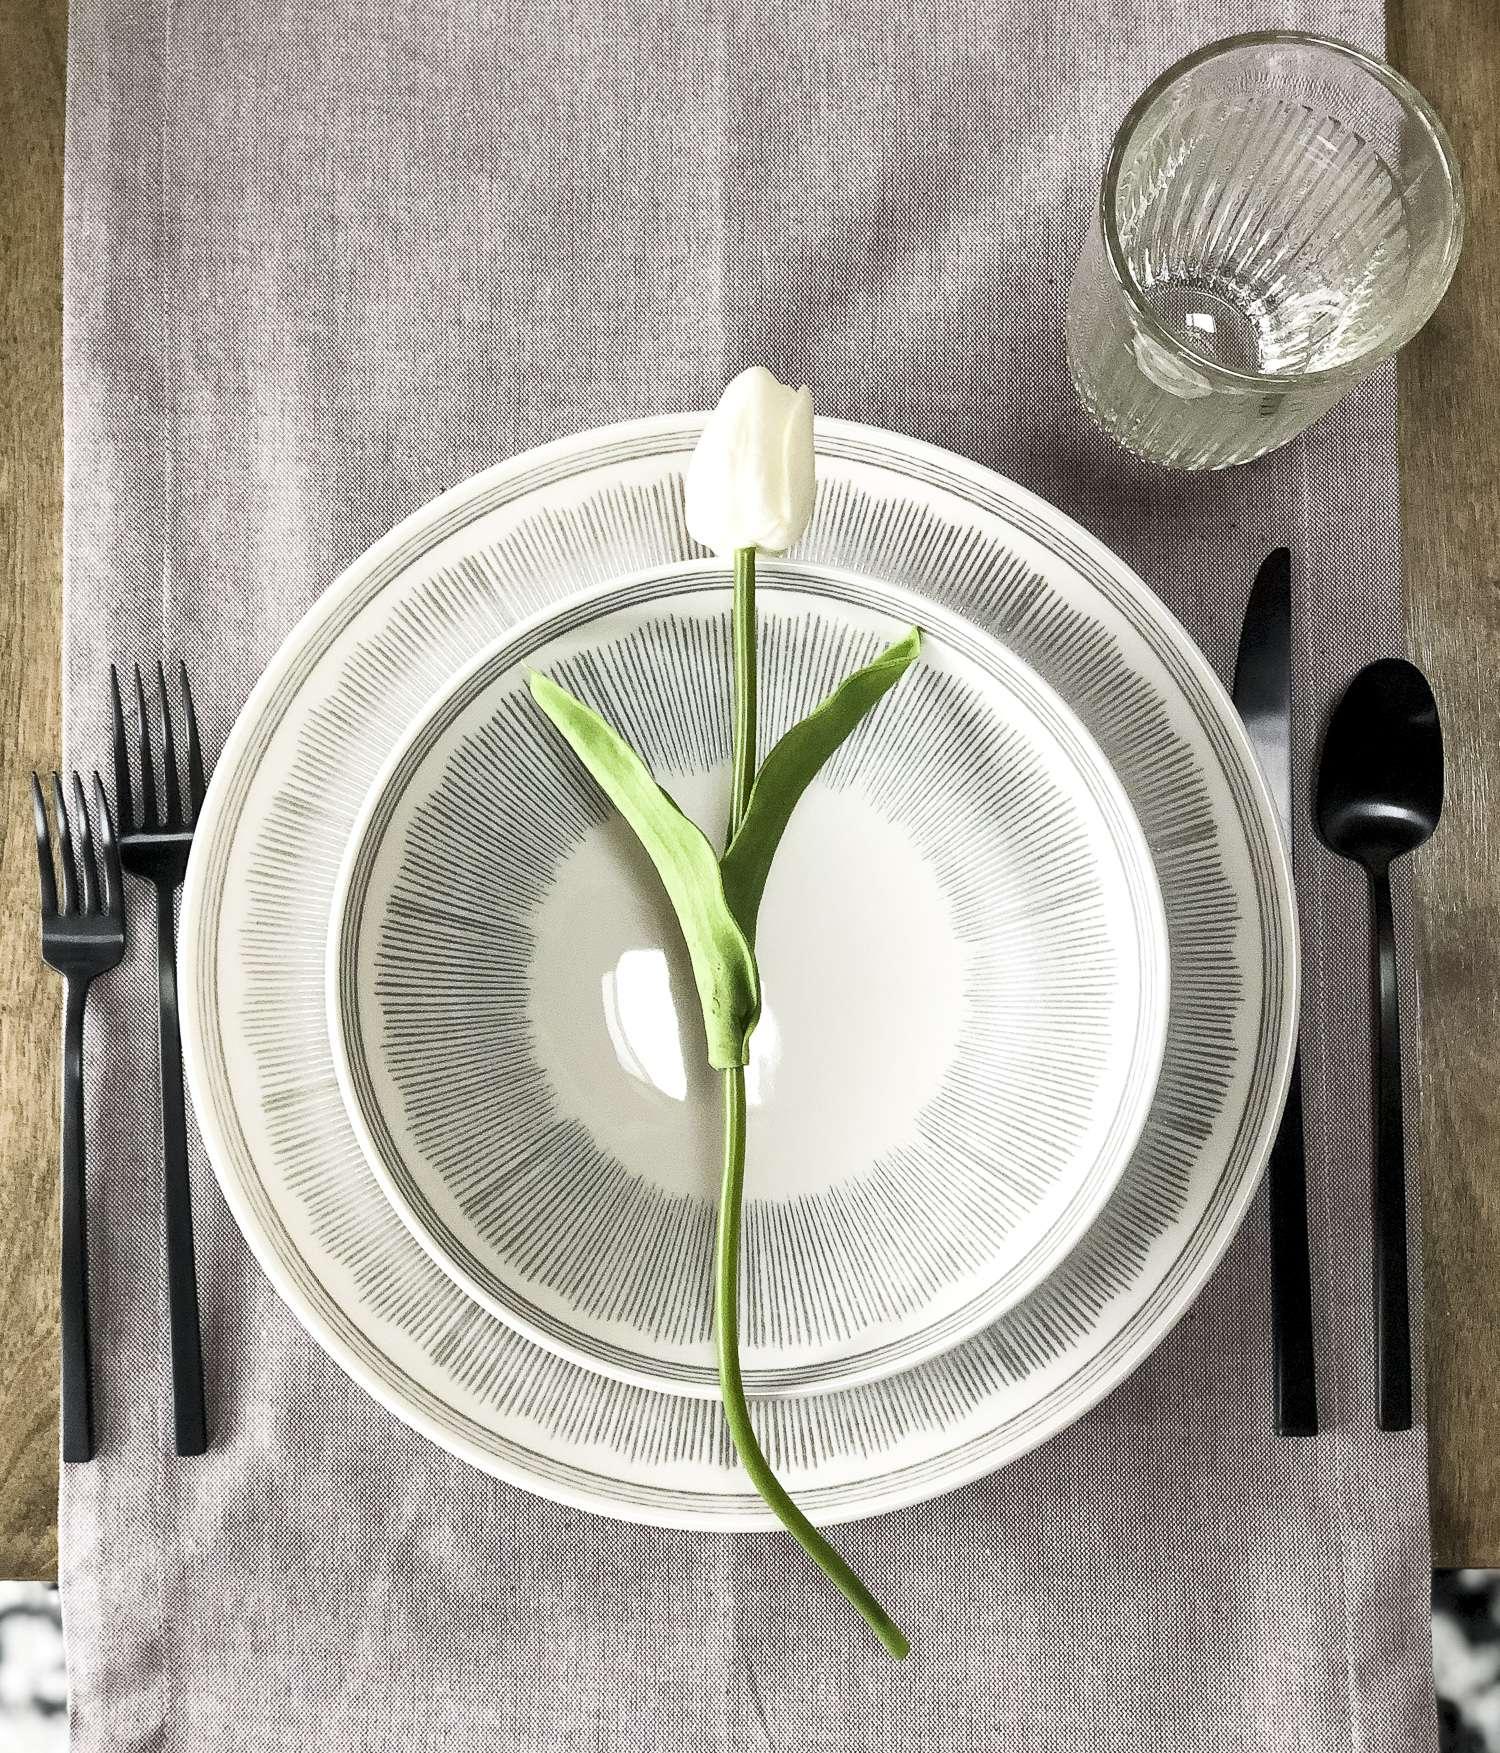 Proper table place setting.